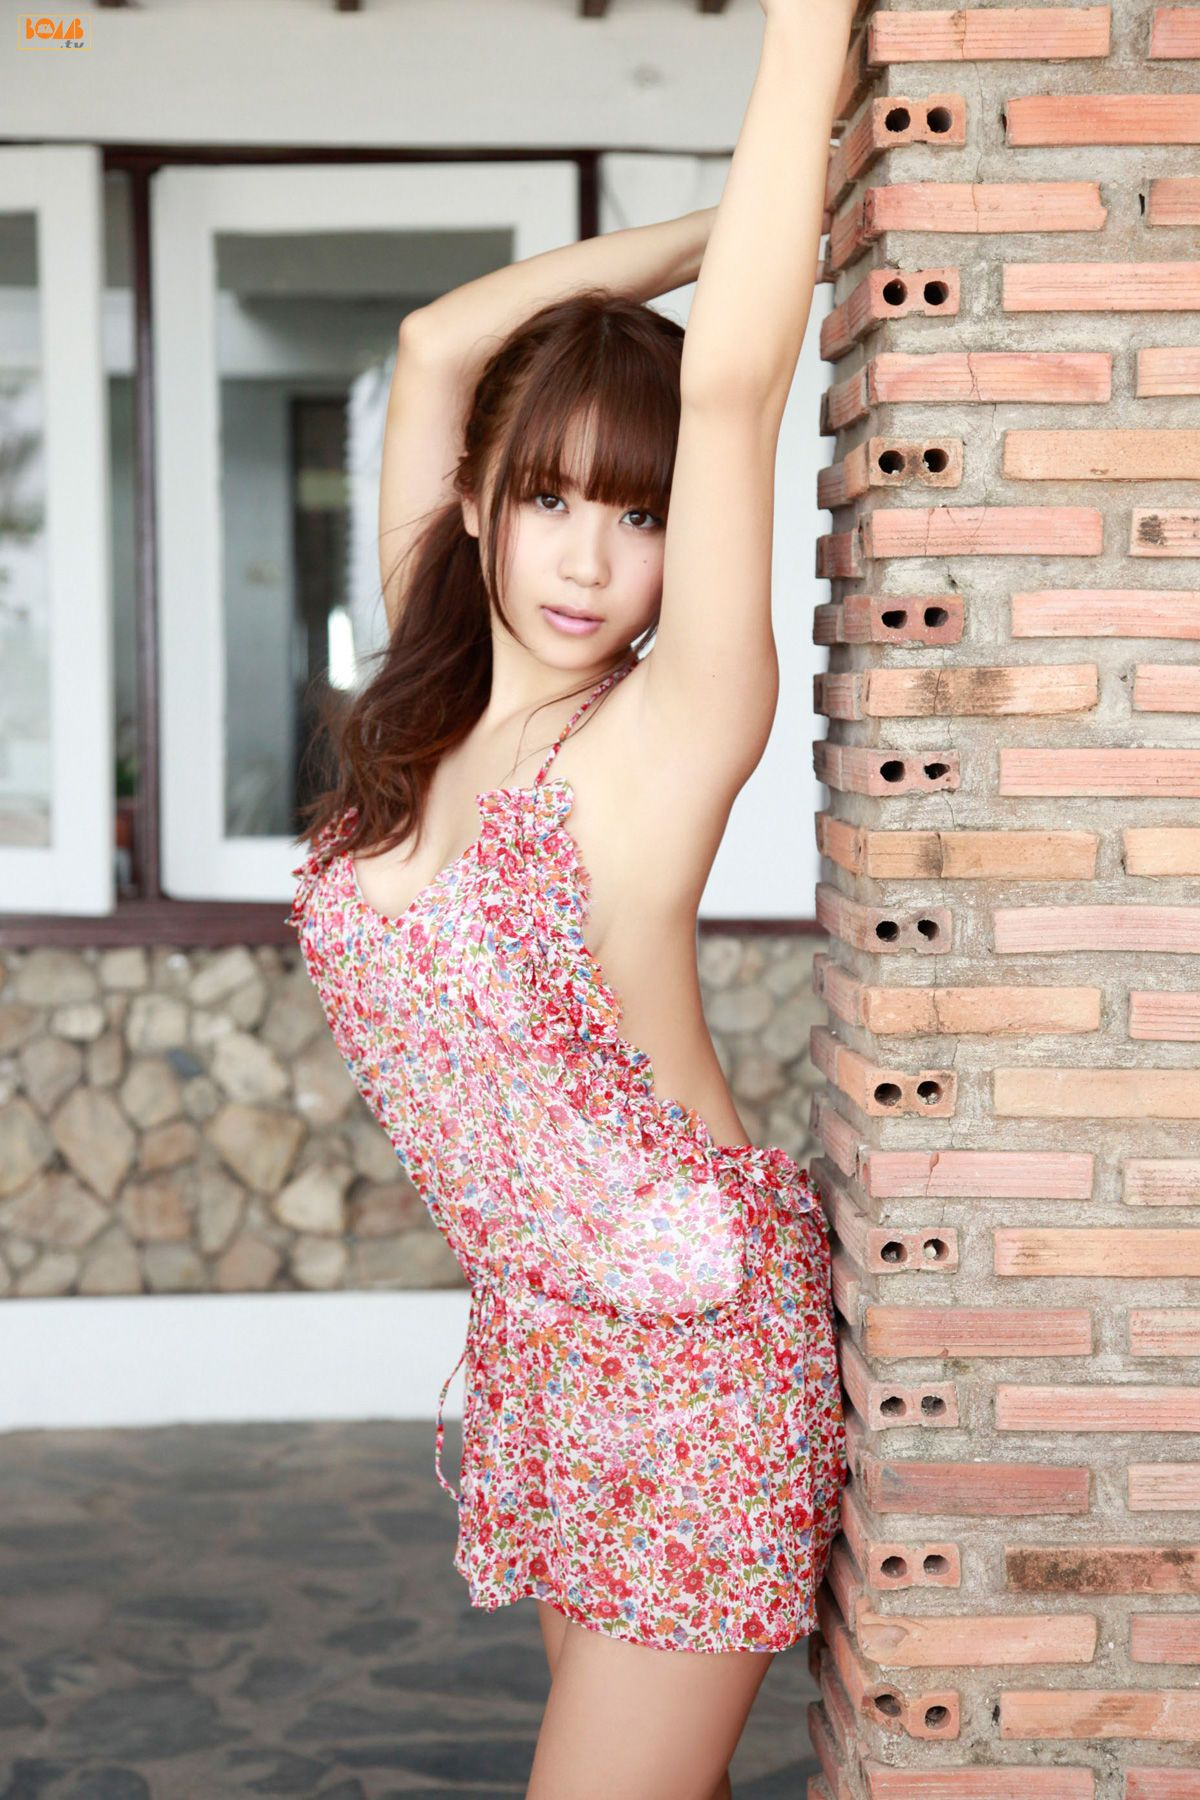 Mai Nishida Nude Photos 71